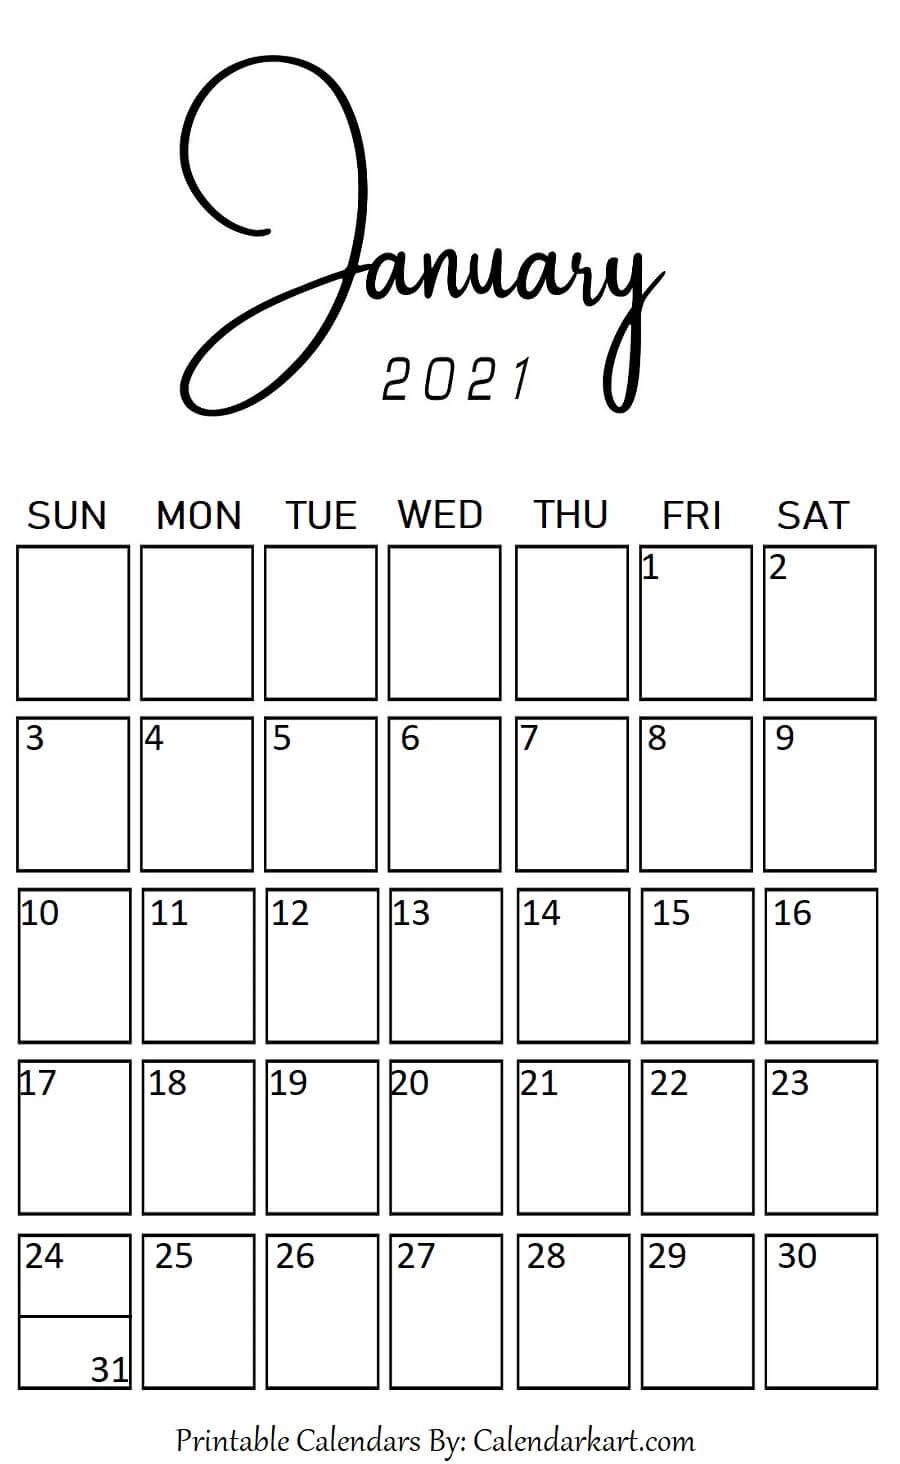 January 2021 Portrait (Vertical) Style Calendar | Calendar